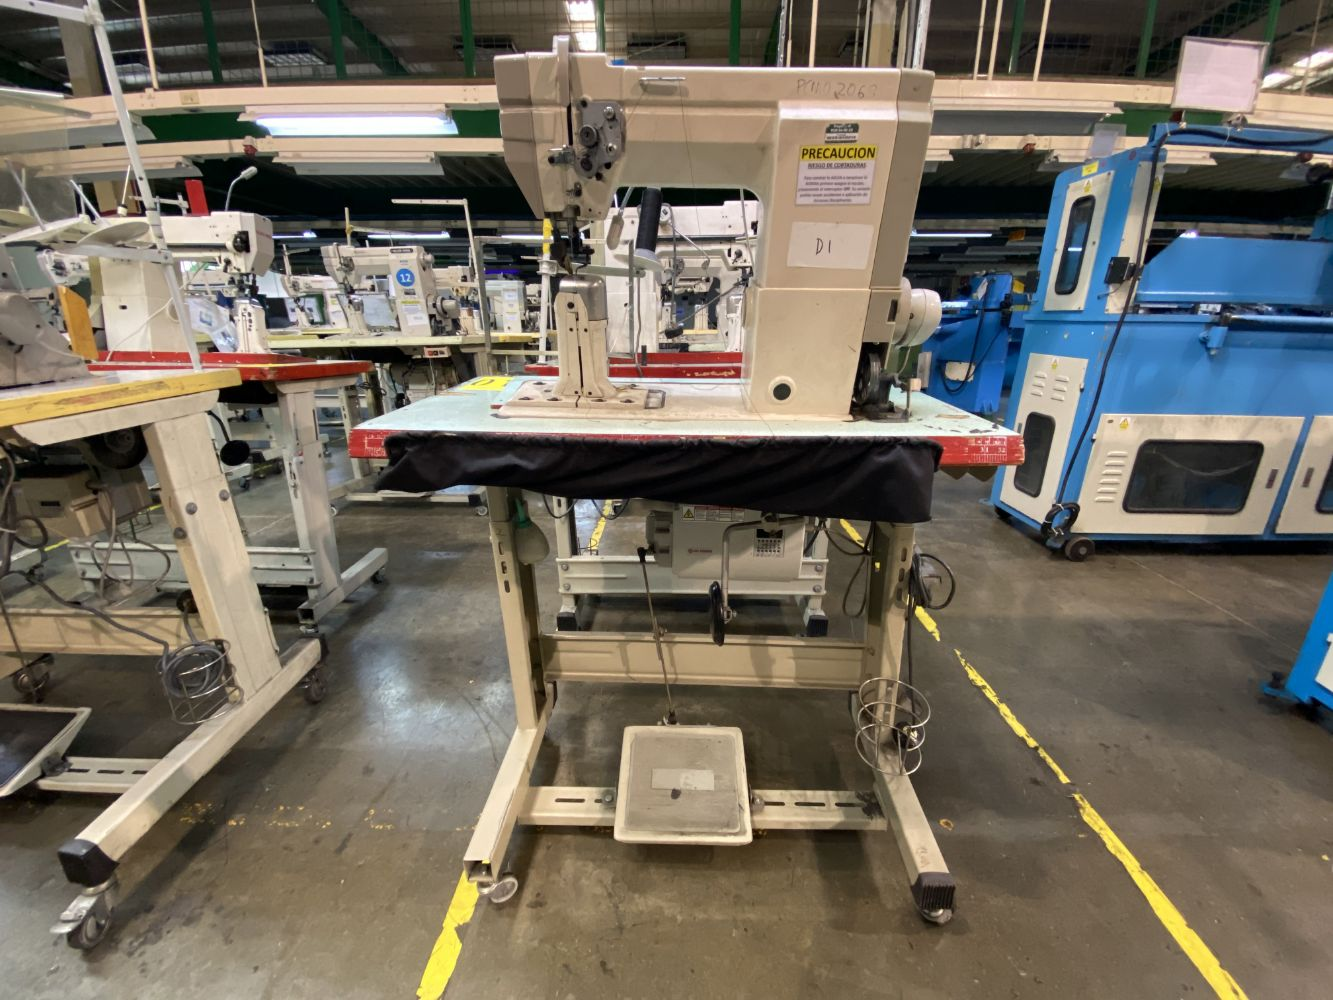 Pou Chen - Apparel and textile industrial equipment.